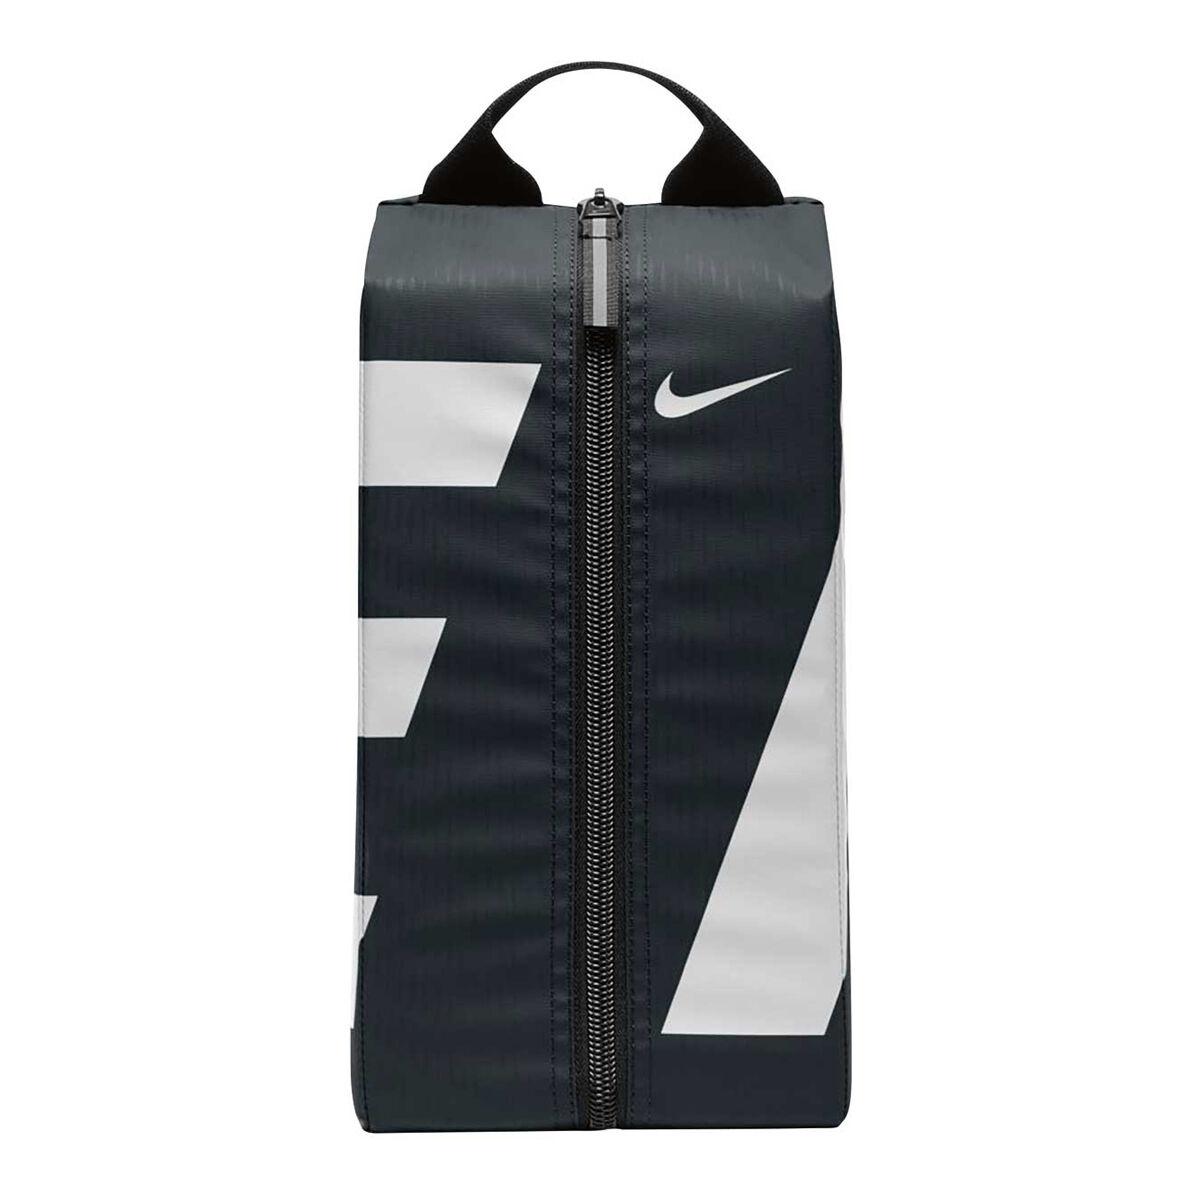 Nike Basketball Bags On Sale | Jaguar Clubs of North America